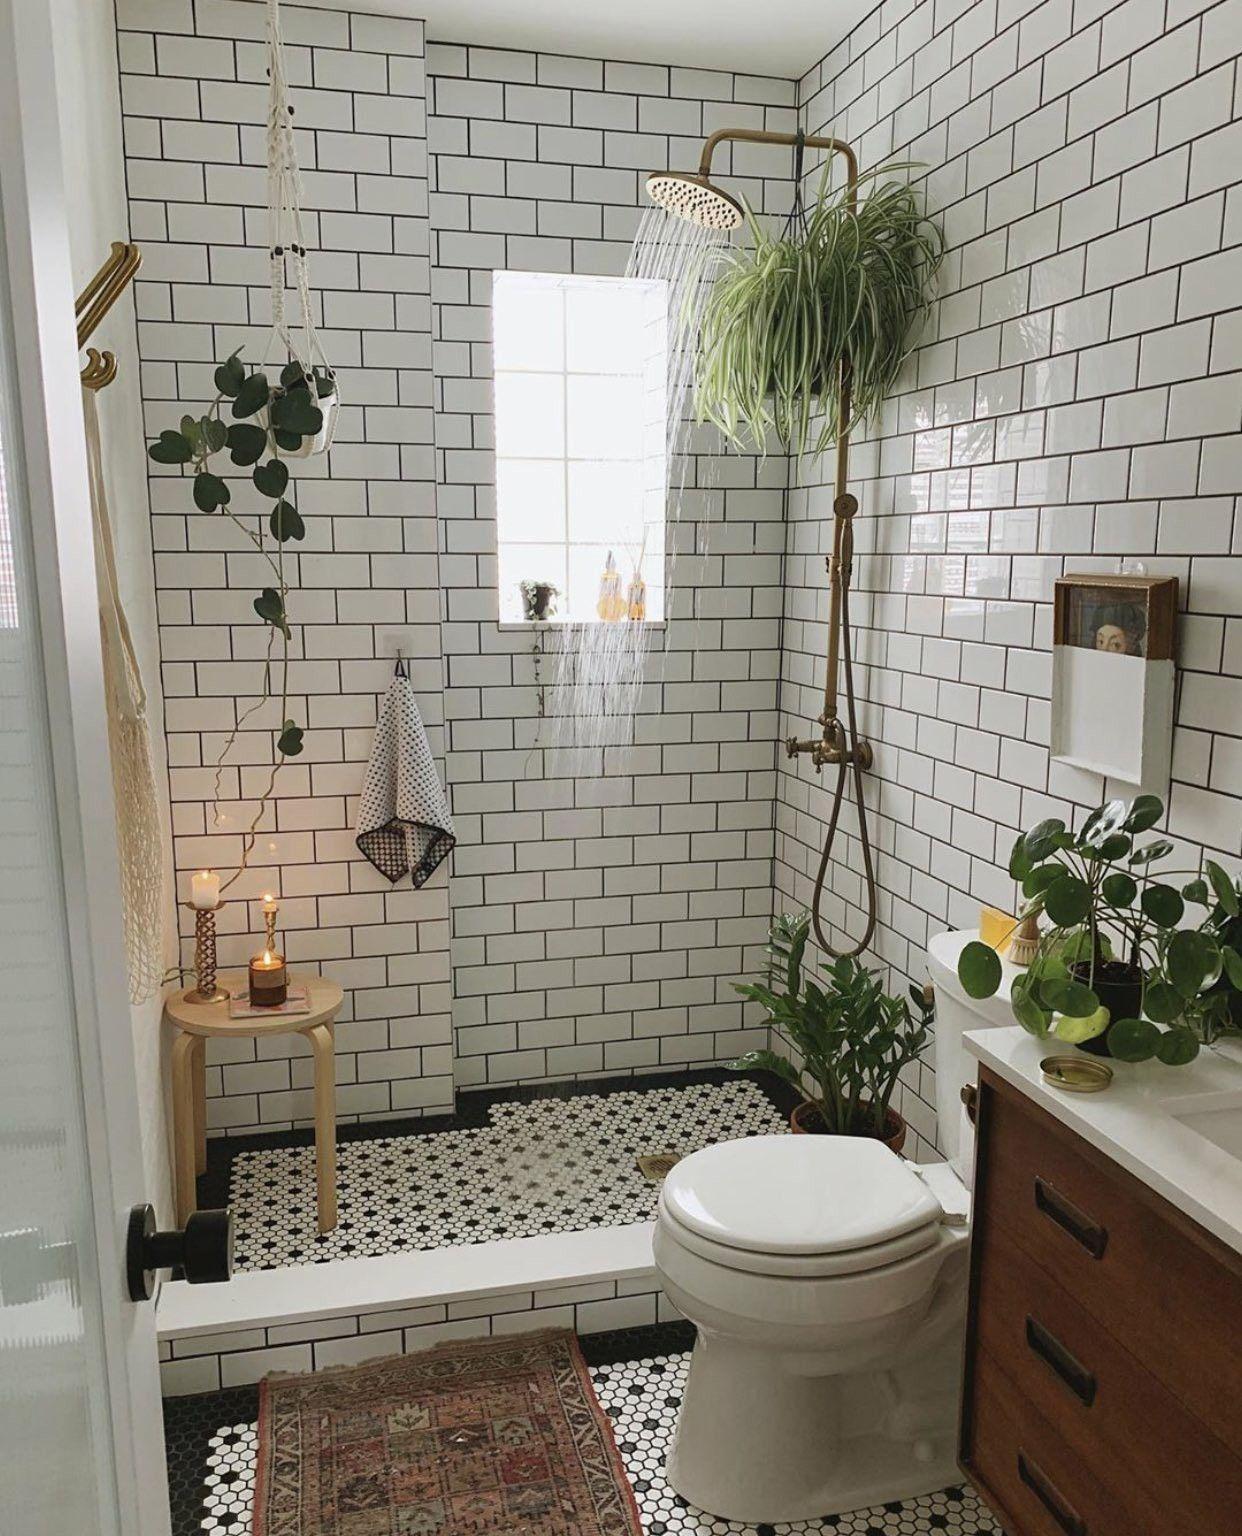 Lush bathroom decor